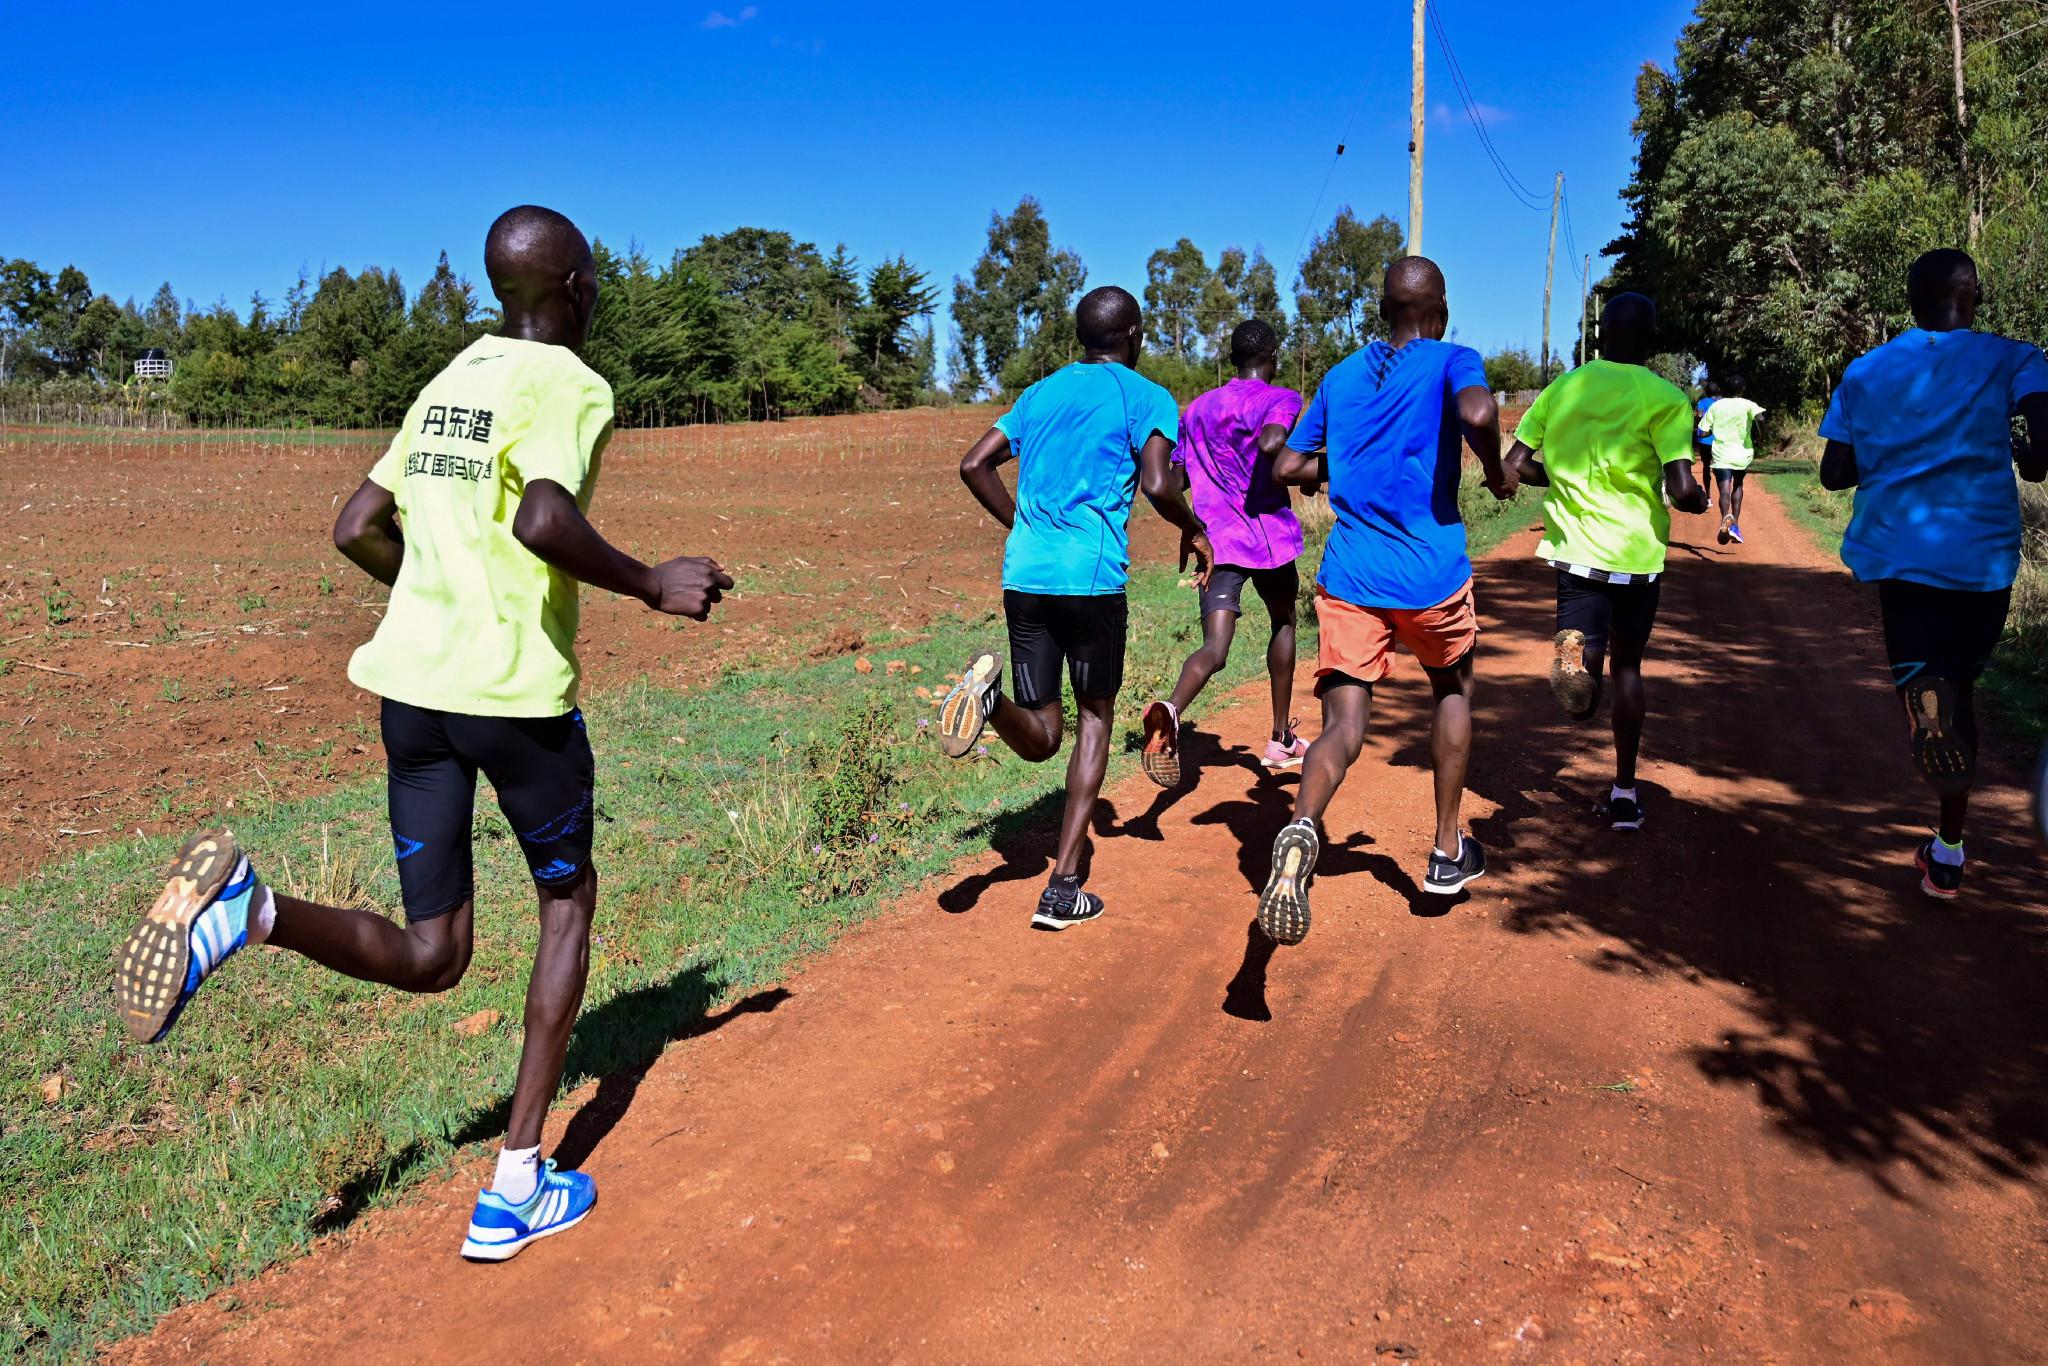 Athletics Kenya refute doping accusations after syringe image goes viral